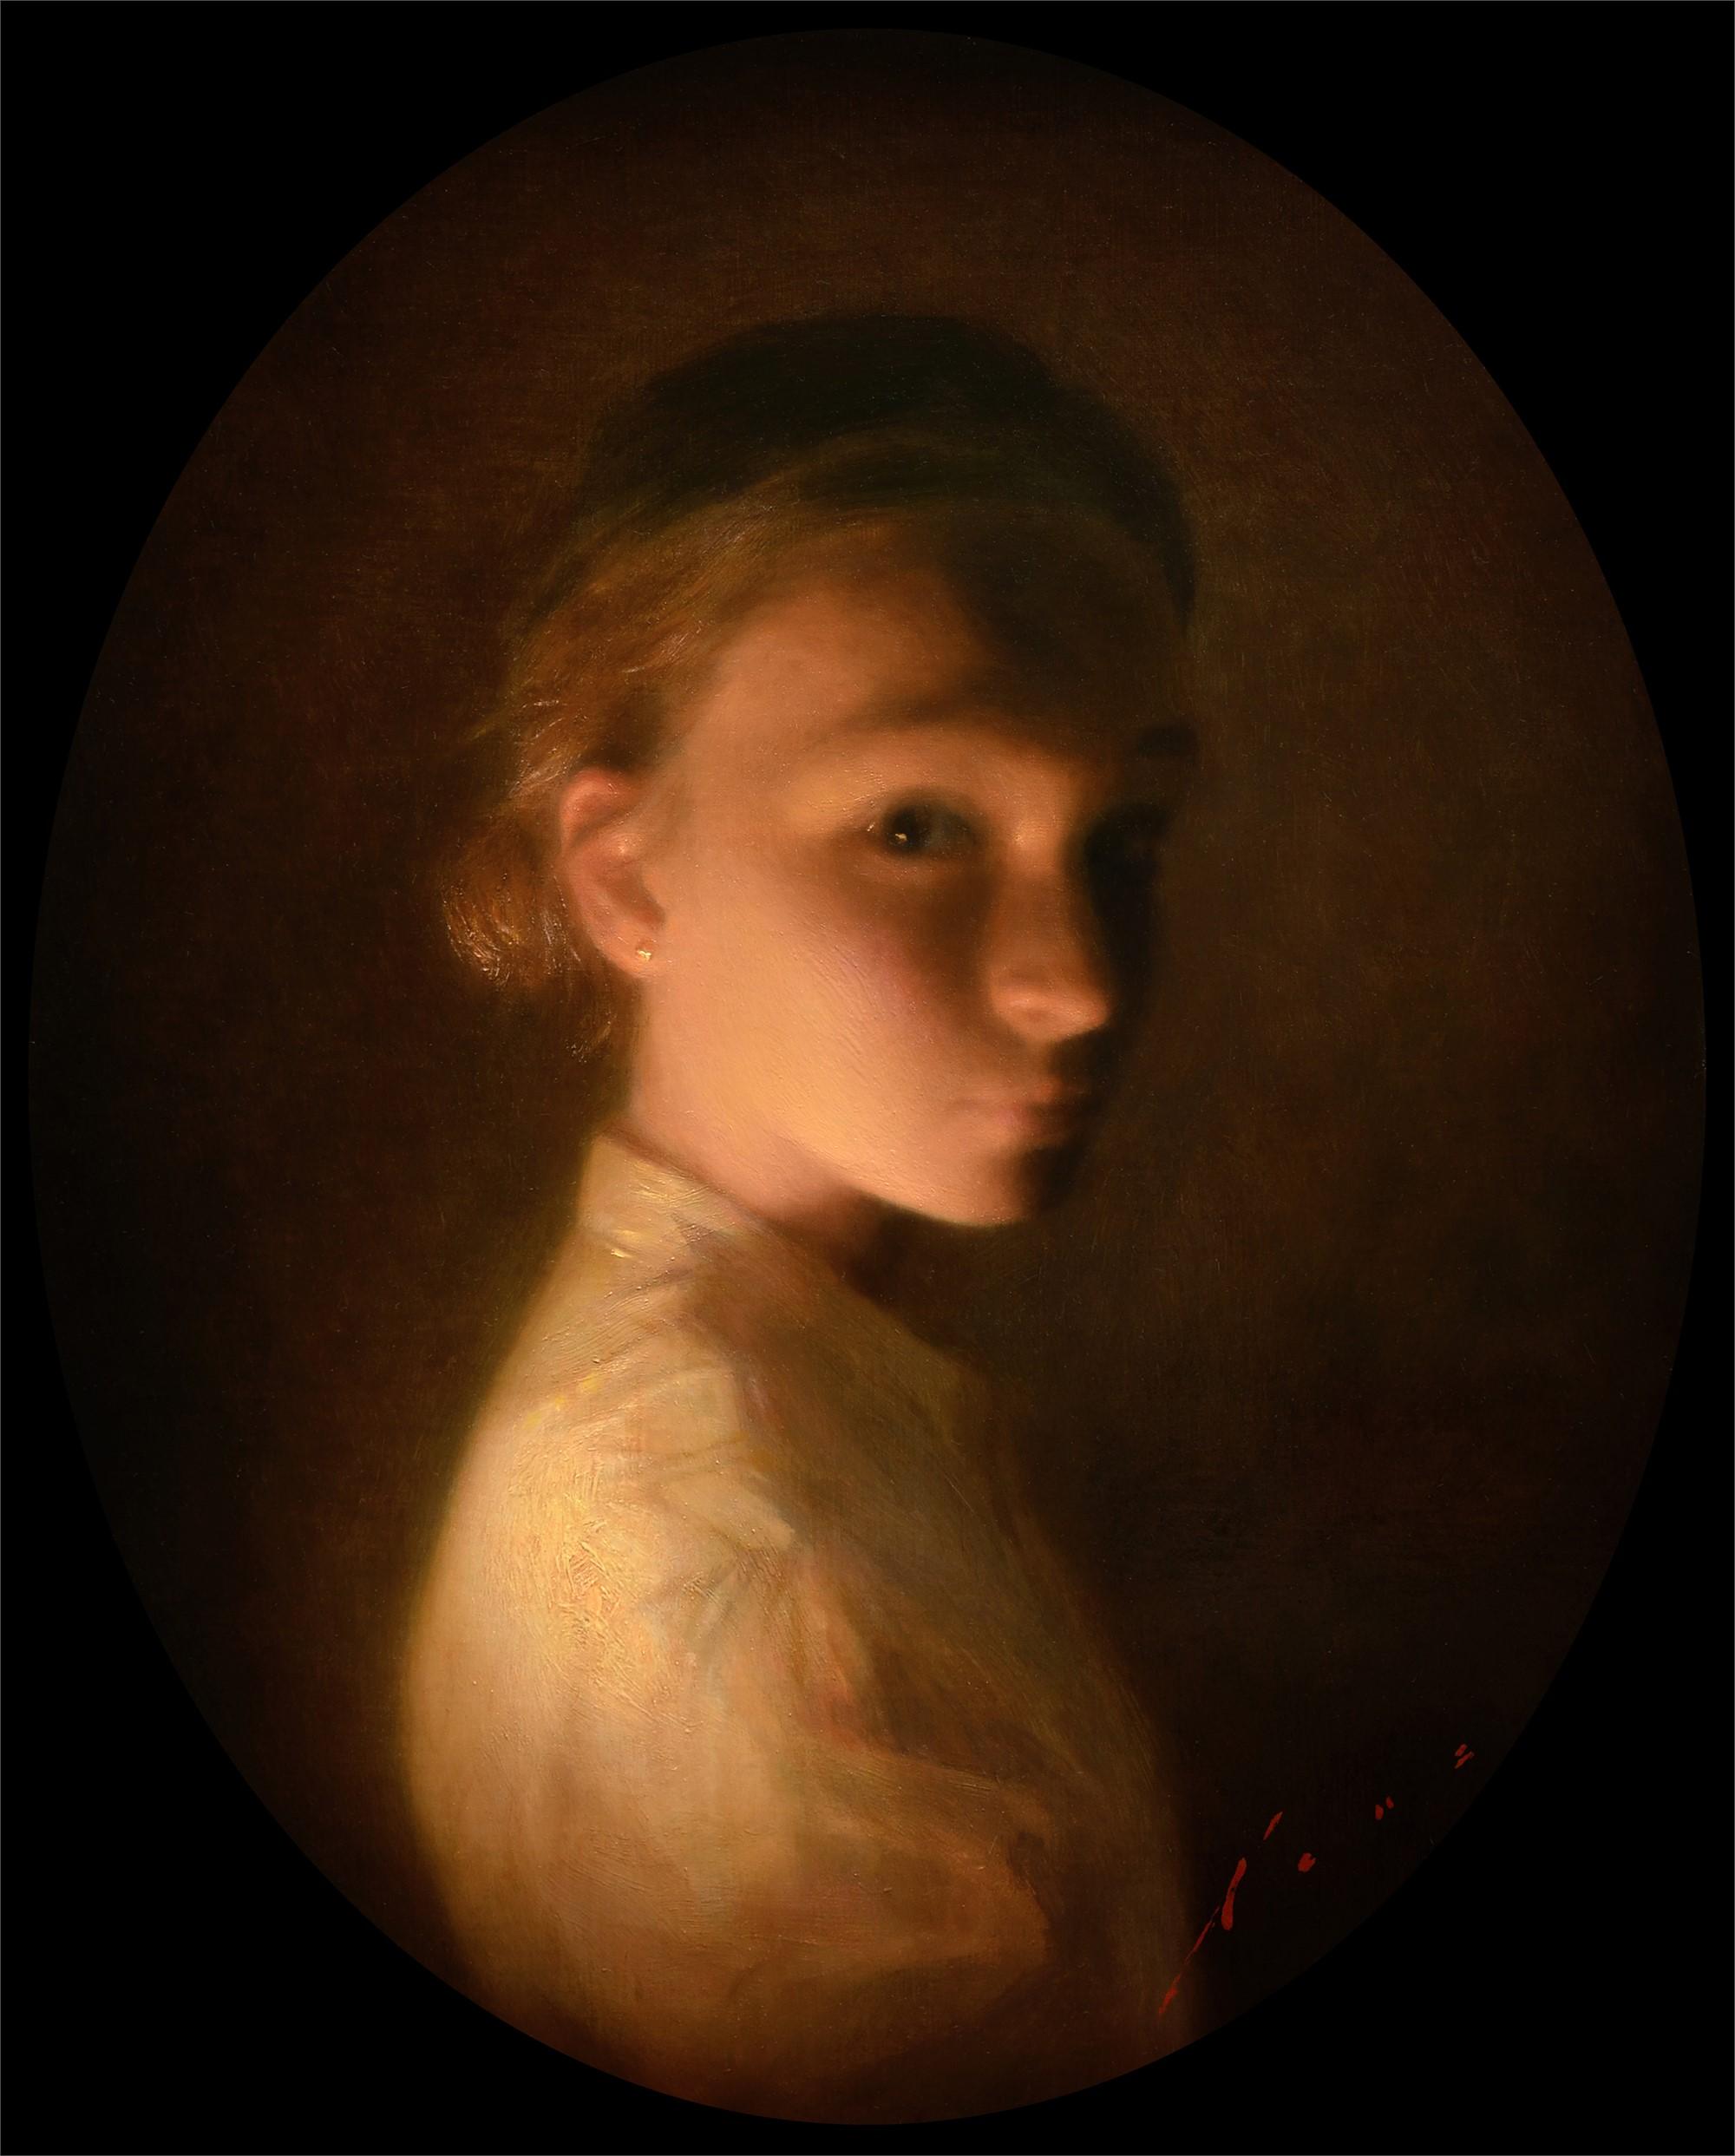 The Light Guardian by Vincent Xeus